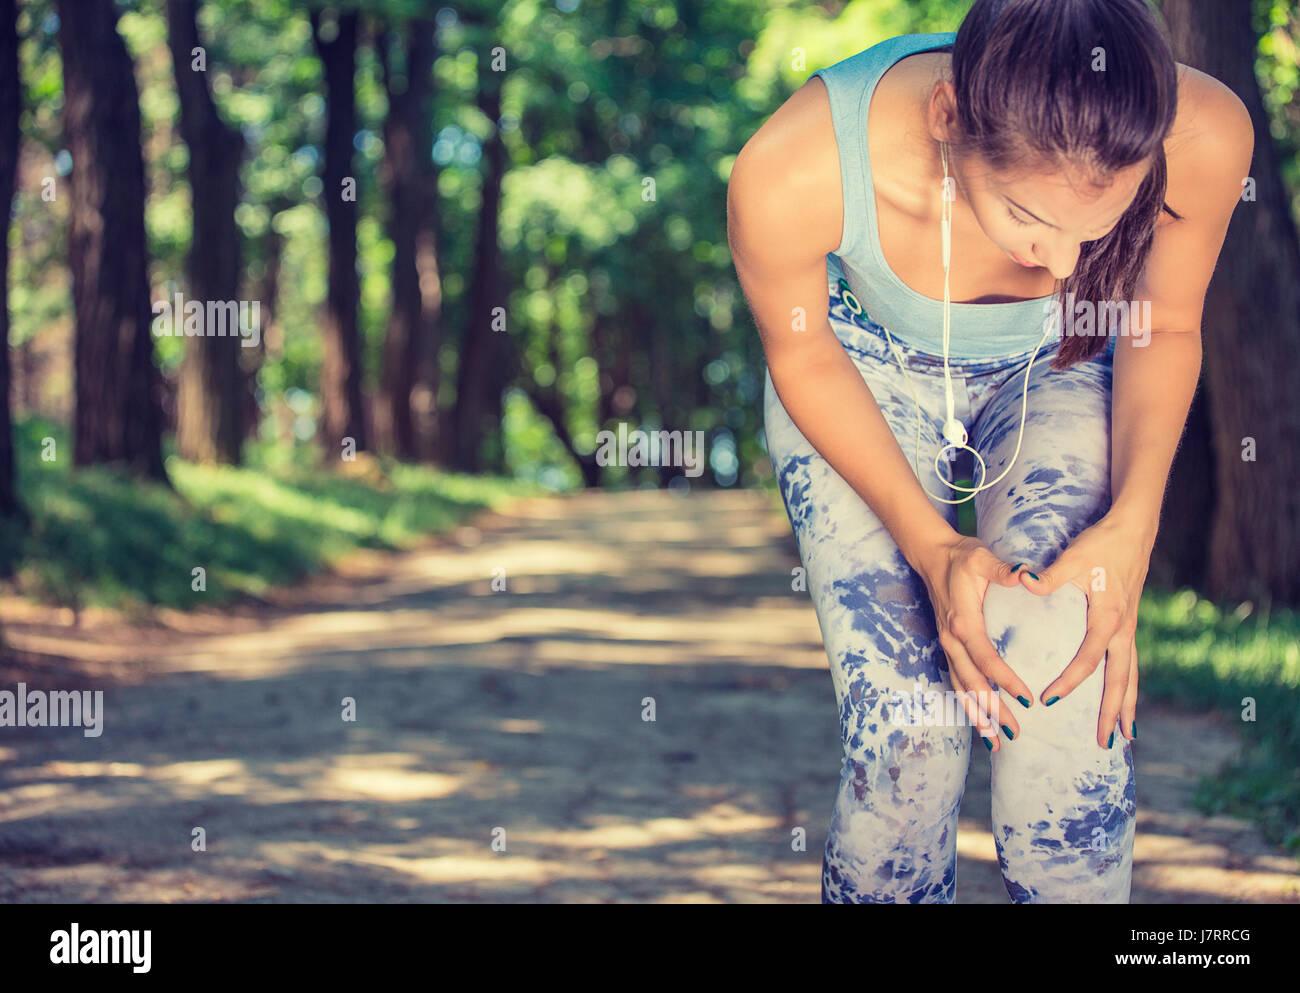 Female athlete runner touching knee in pain, fitness woman running in summer park. - Stock Image